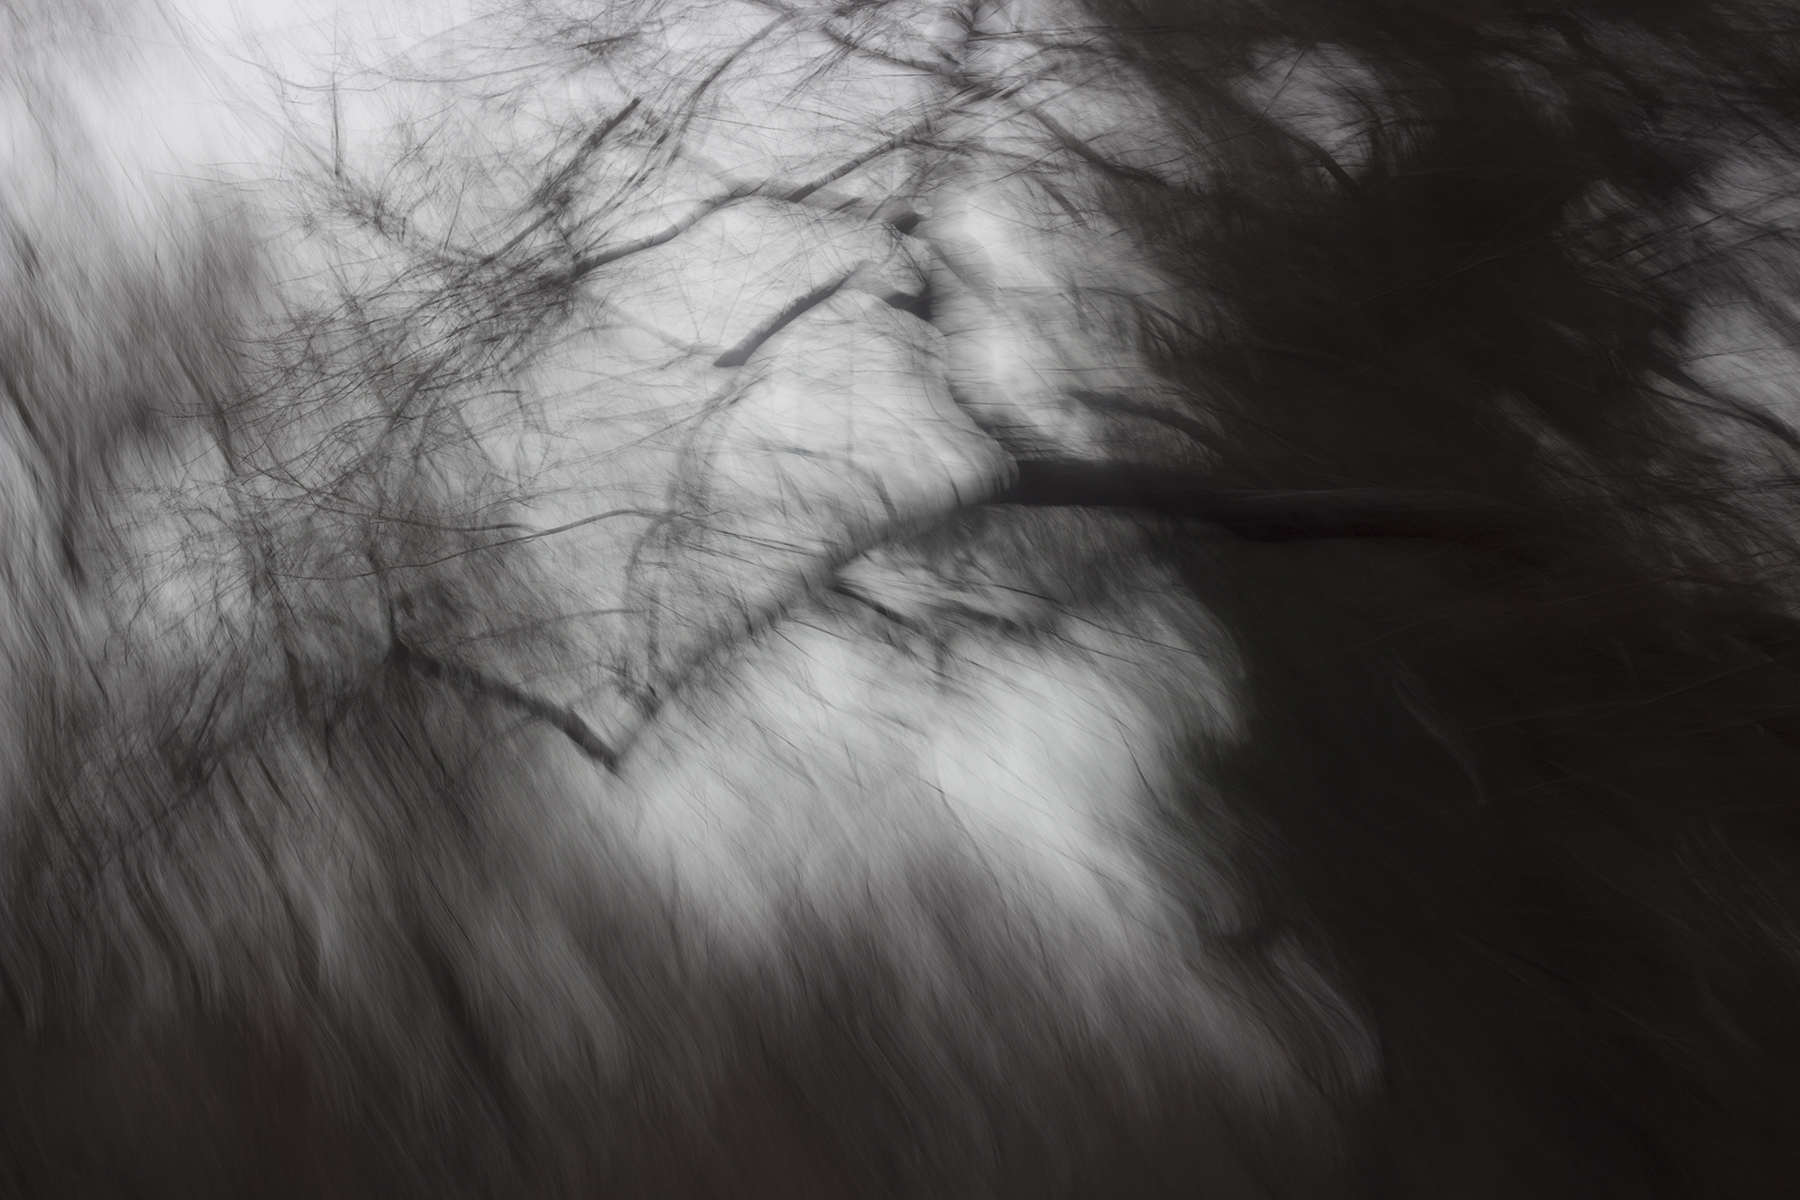 Mahnoor_Khan_The World Of Duality_Ghosts Among Us_03.jpg